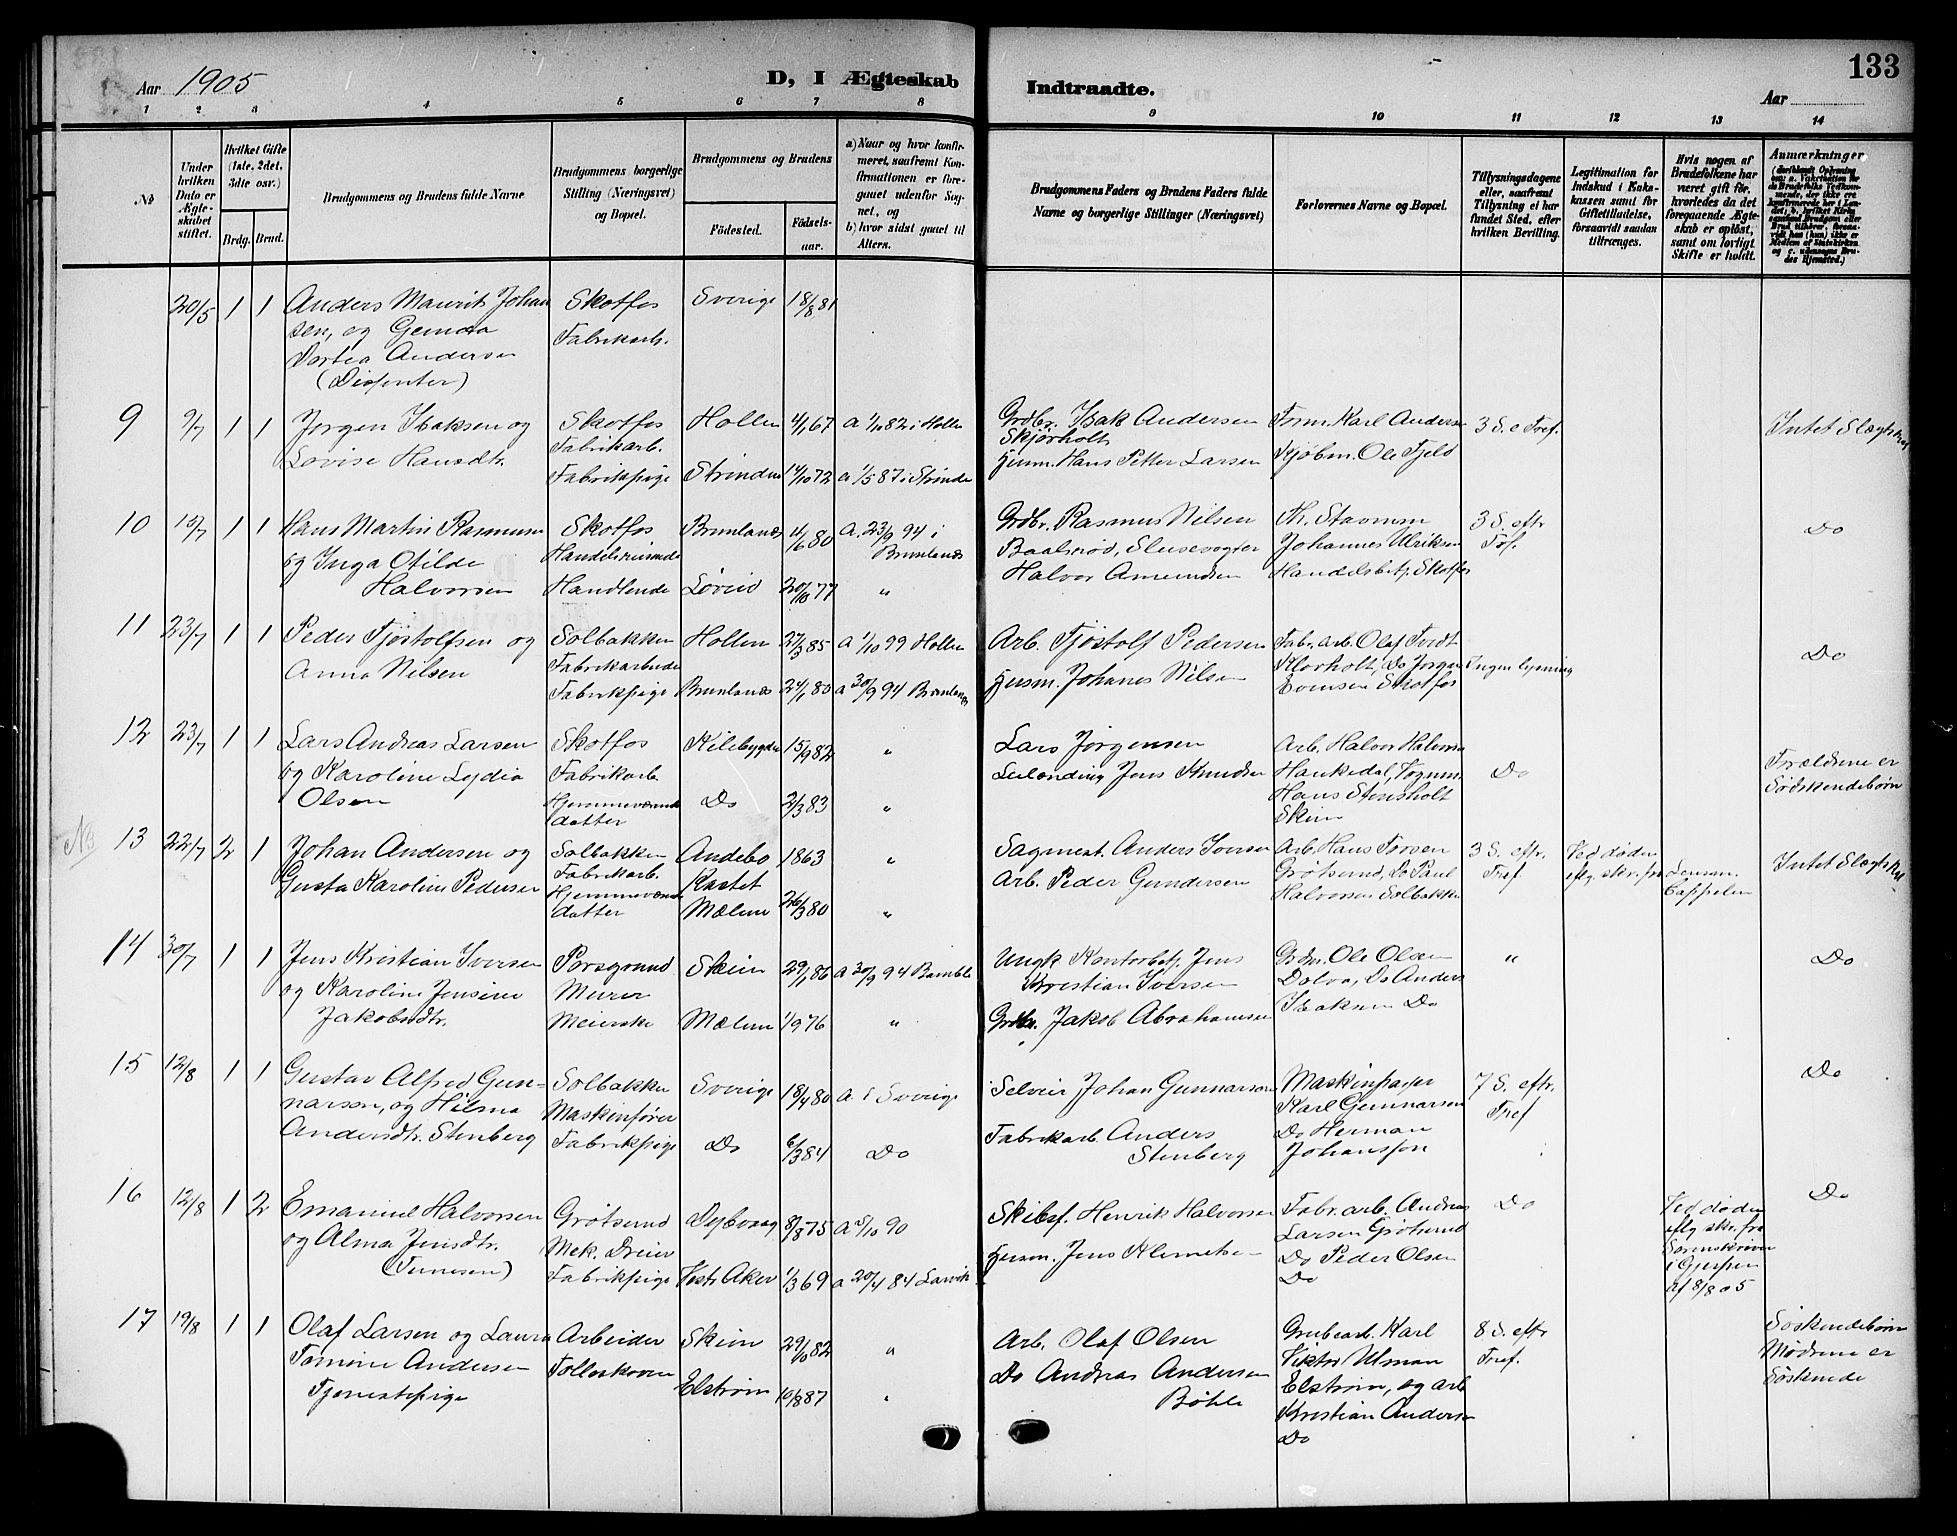 SAKO, Solum kirkebøker, G/Gb/L0005: Klokkerbok nr. II 5, 1905-1914, s. 133